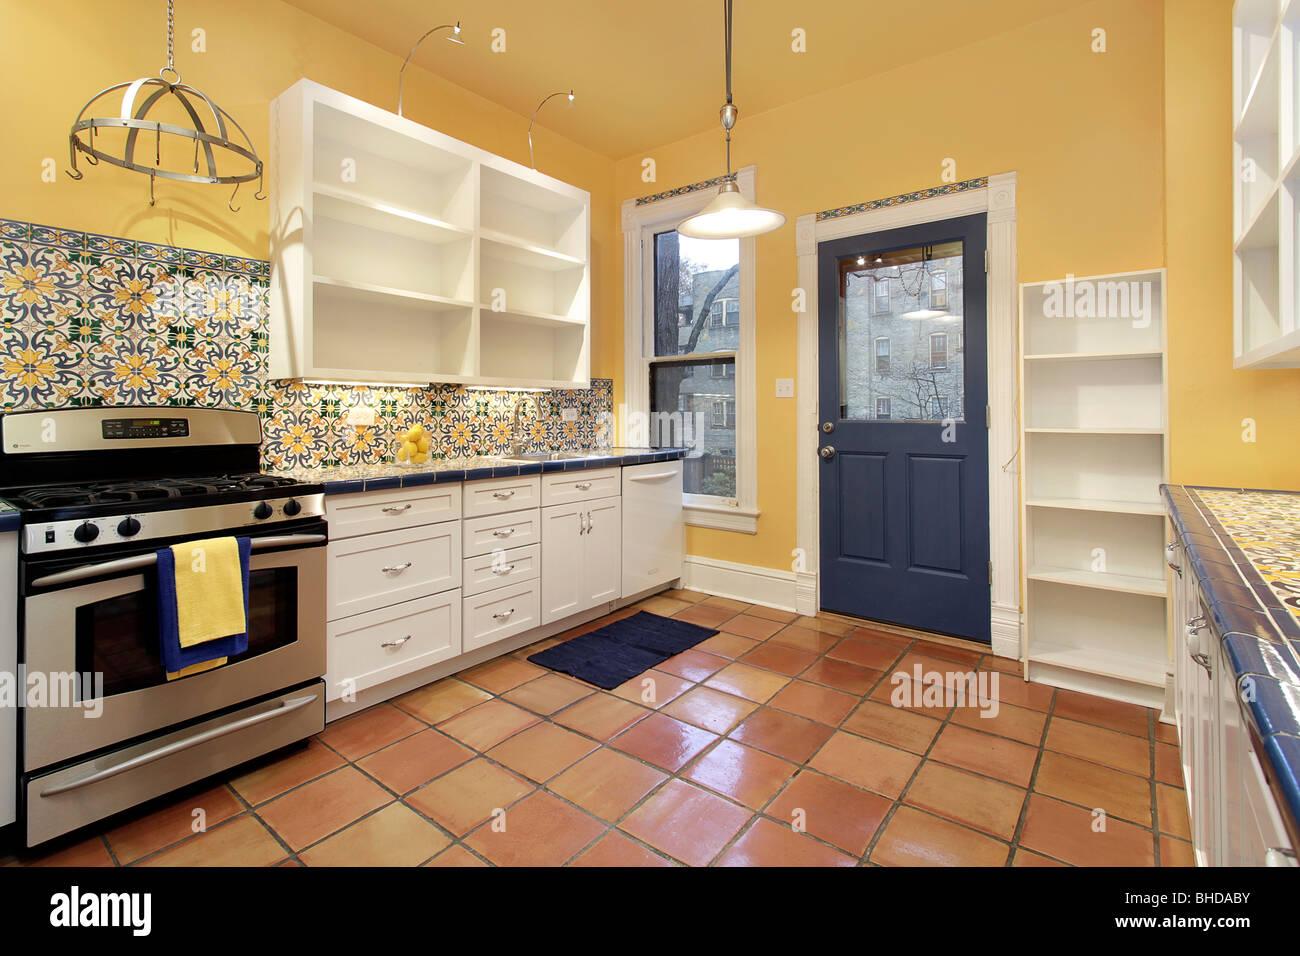 Cucina di casa suburbana con pavimento in cotto piastrelle e